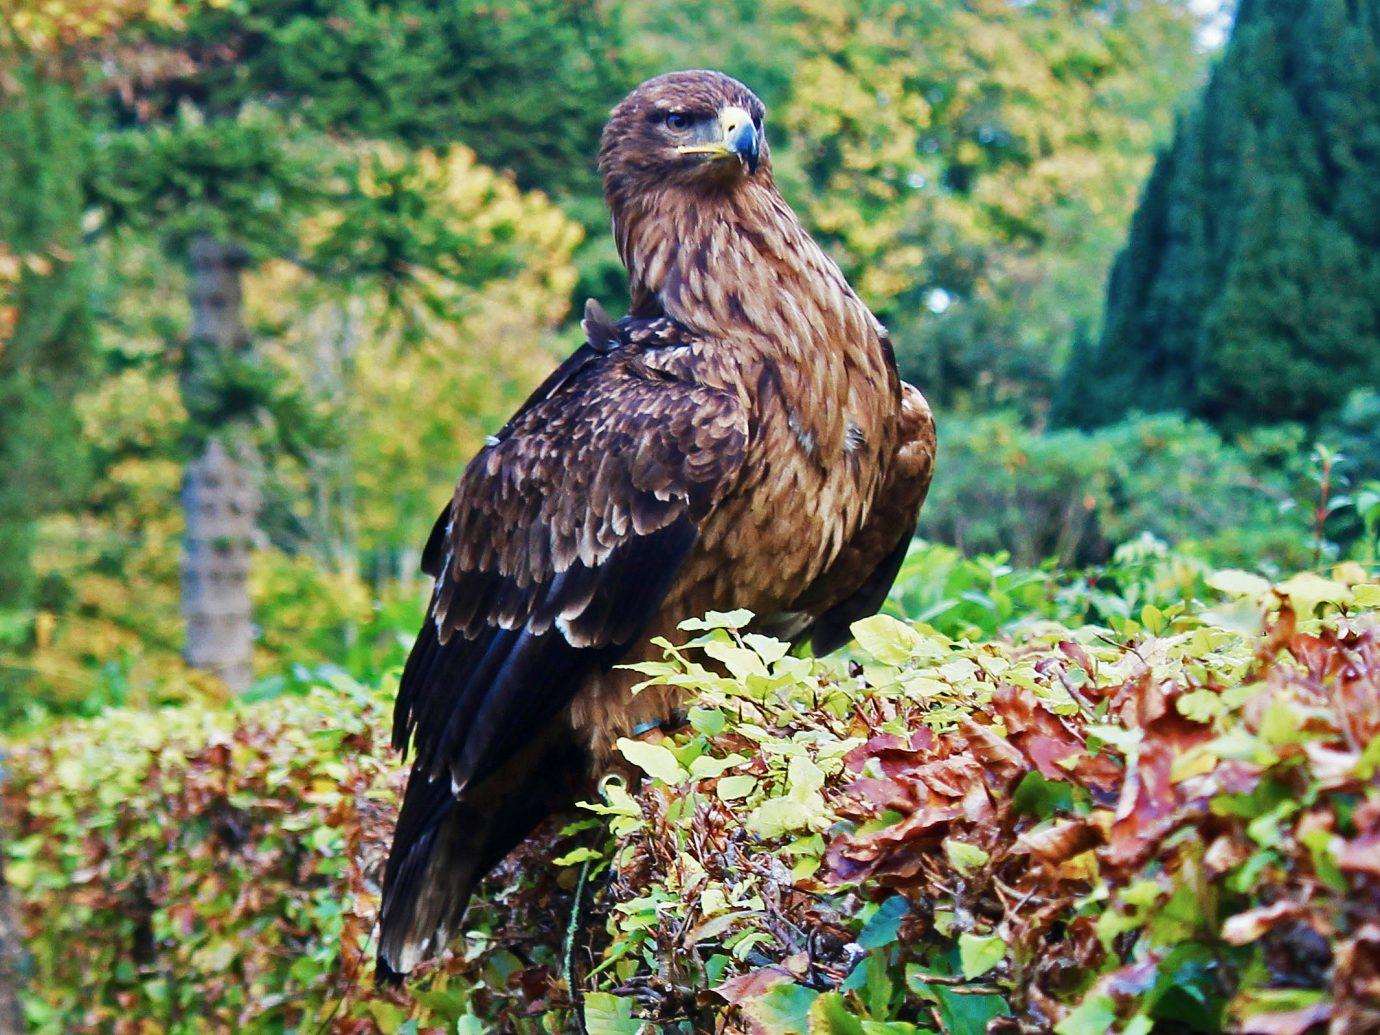 Falcon at Glenapp Castle